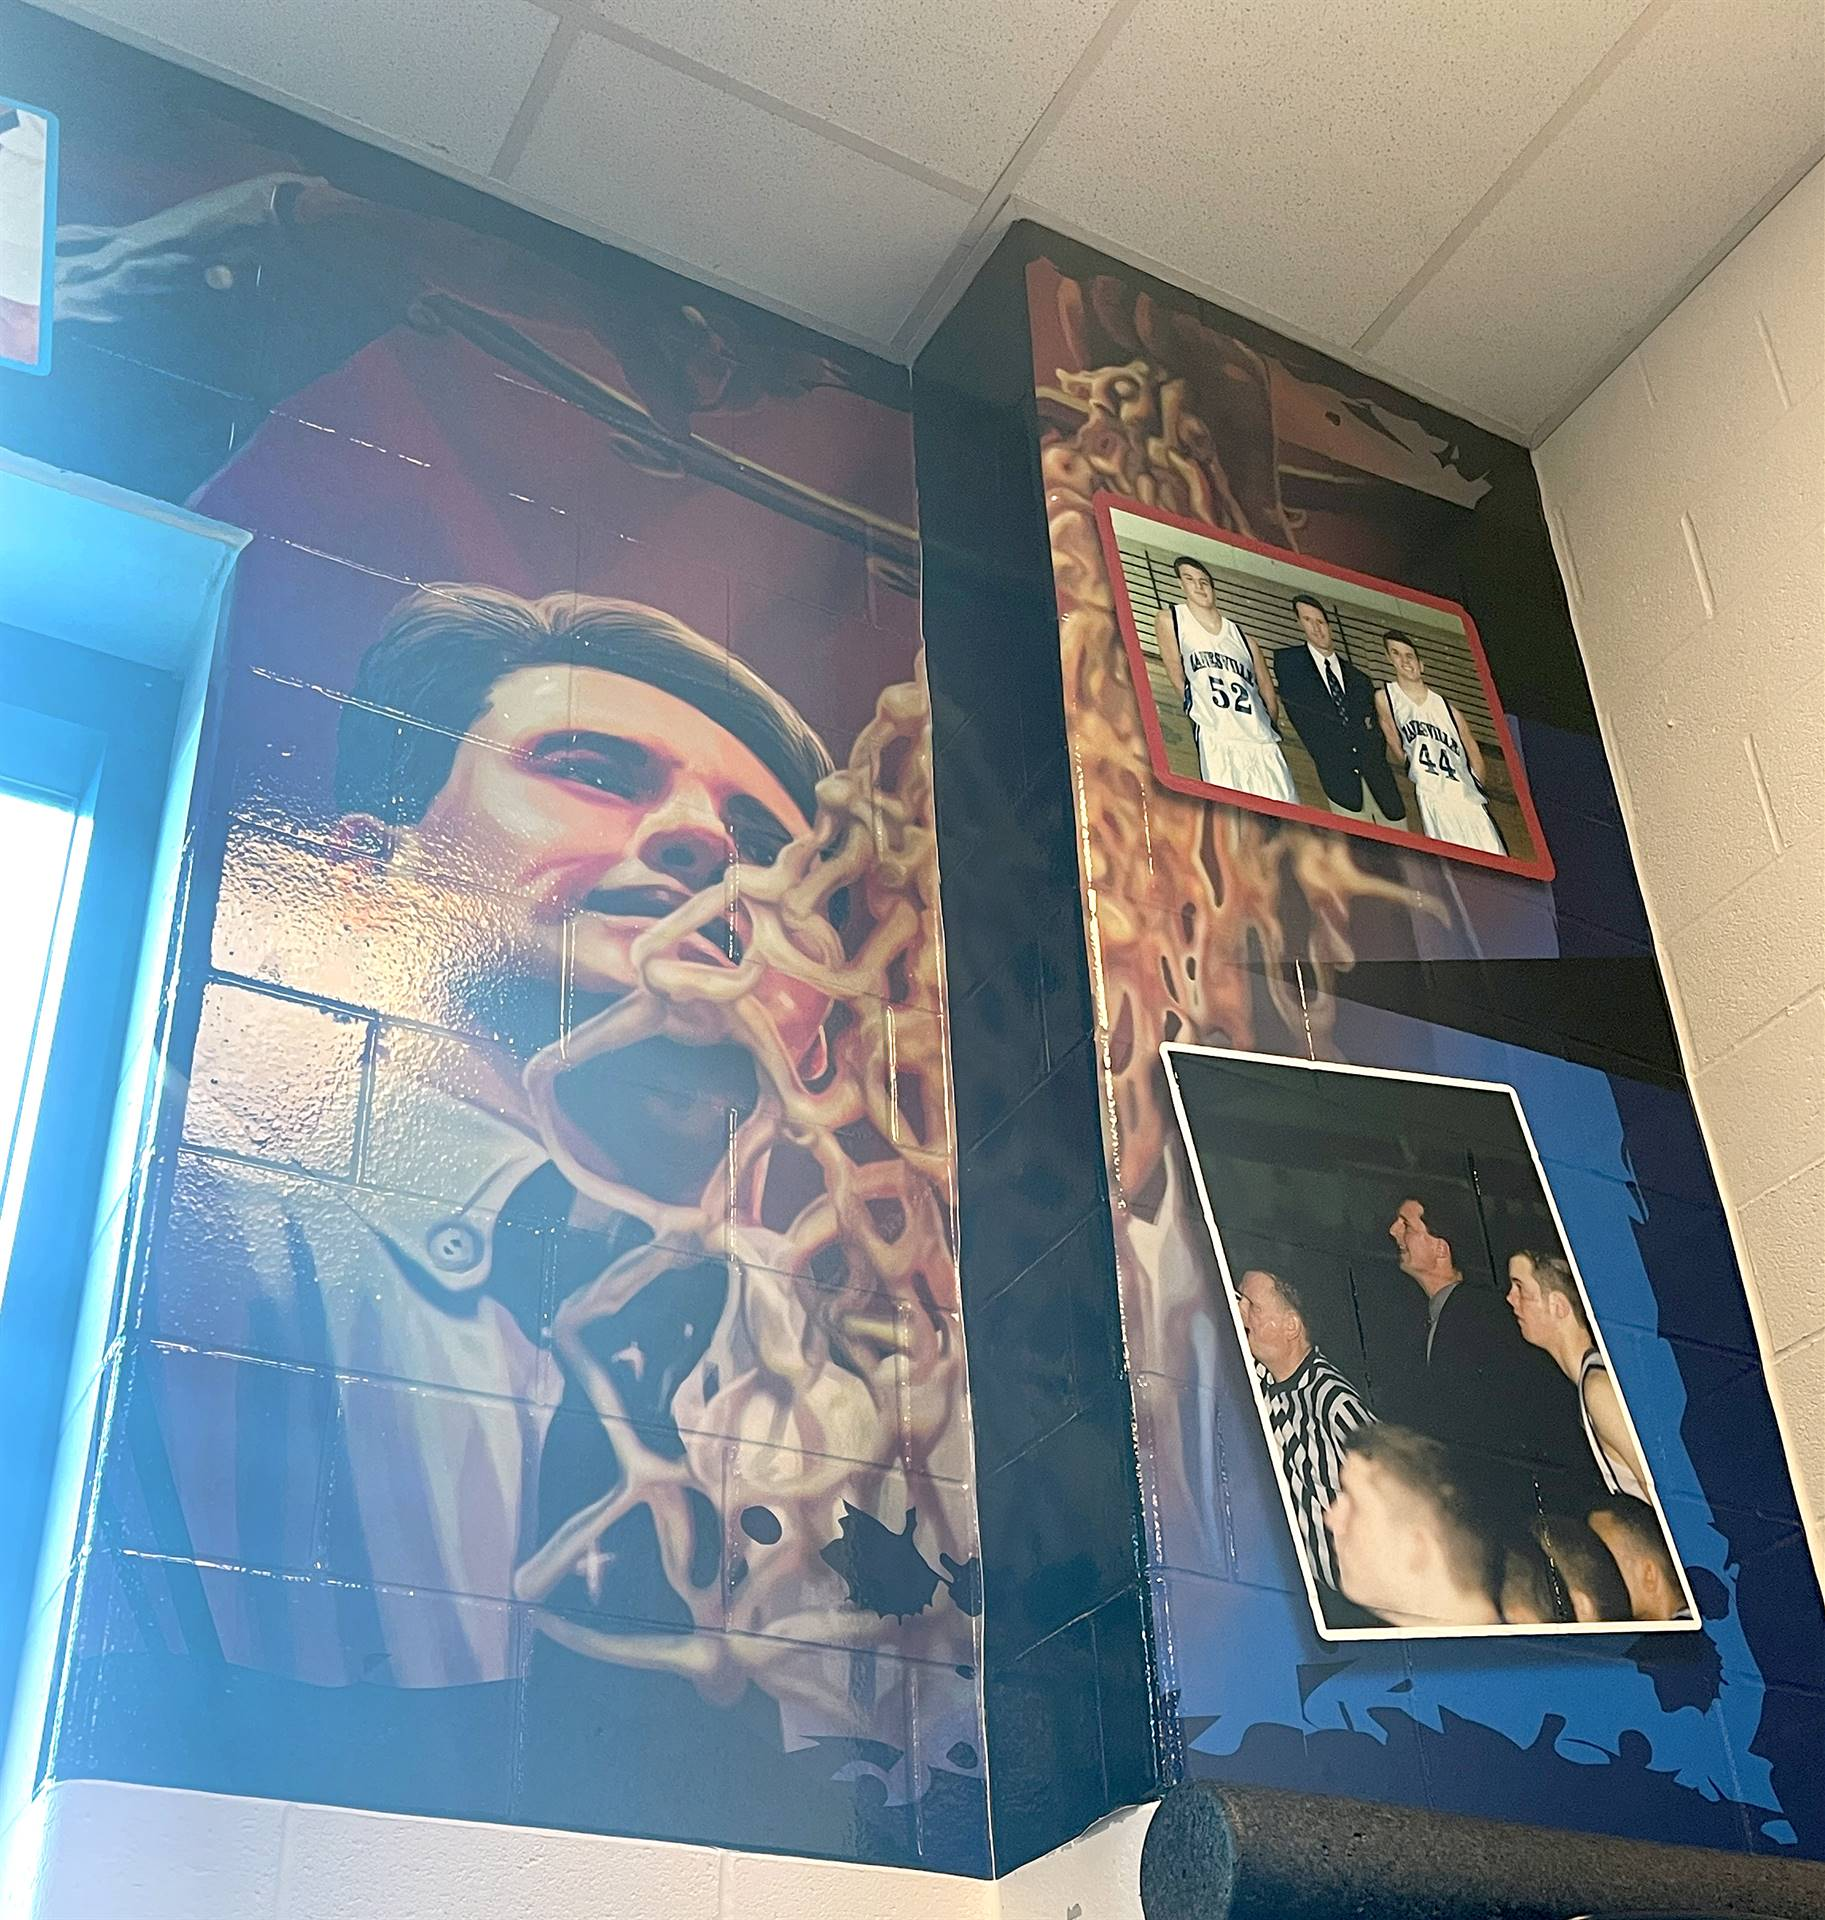 Right panel of artwork